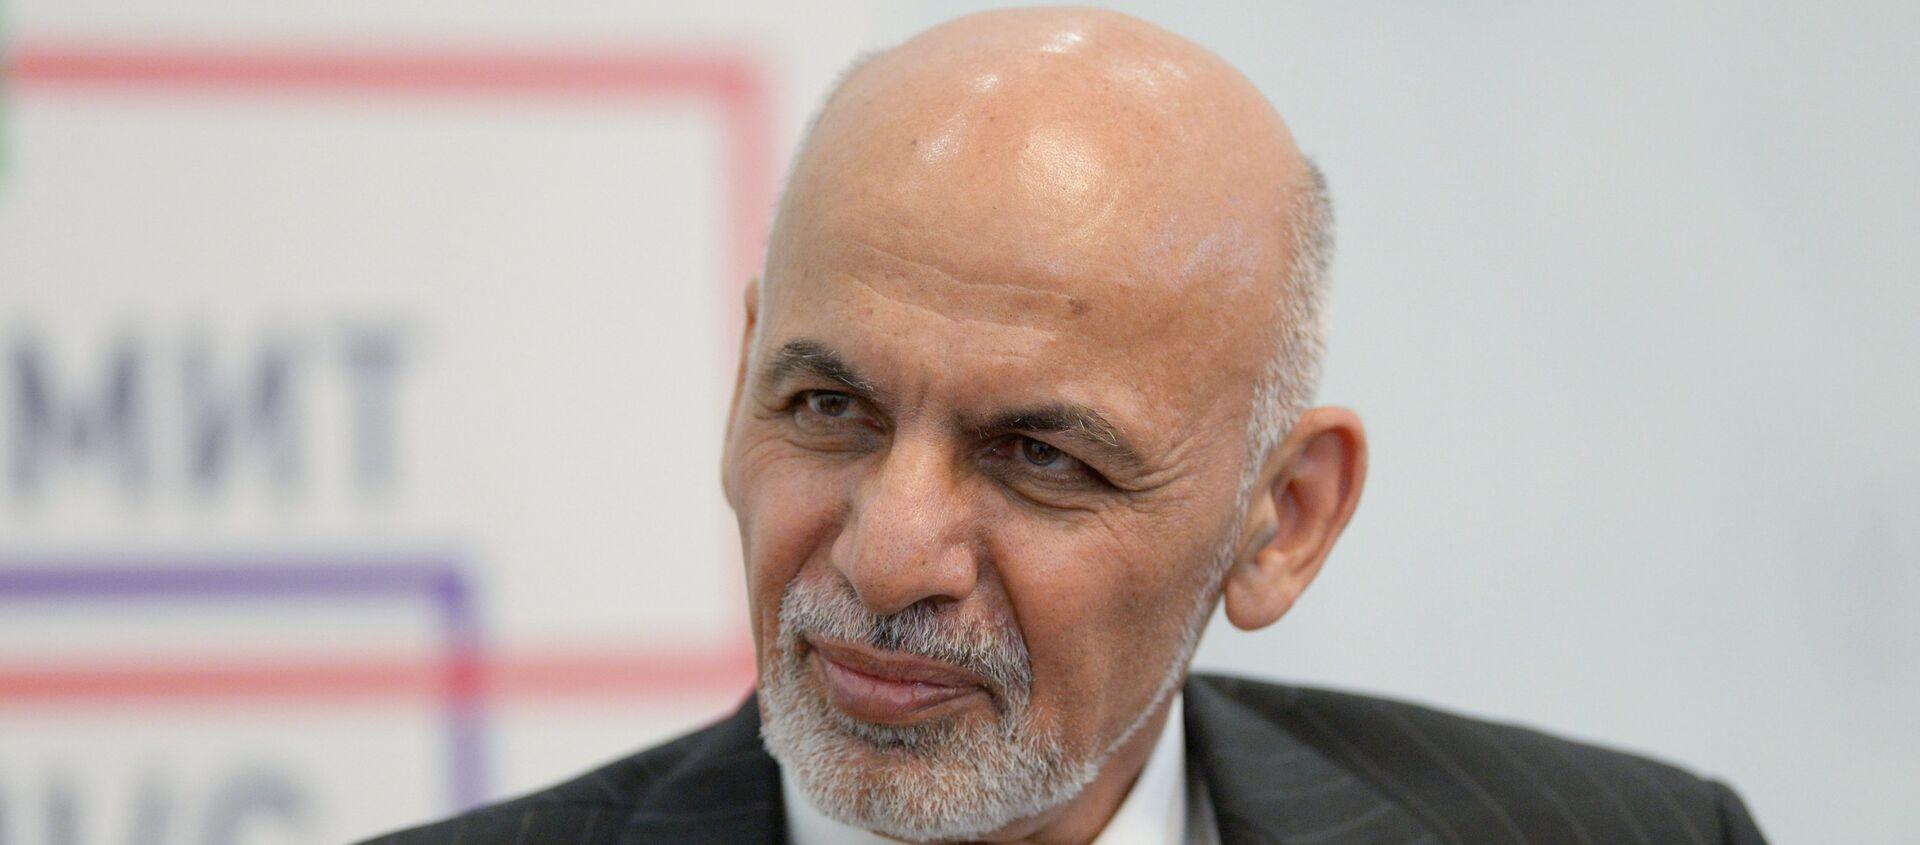 Tổng thống Afghanistan Ashraf Ghani  - Sputnik Việt Nam, 1920, 19.08.2021